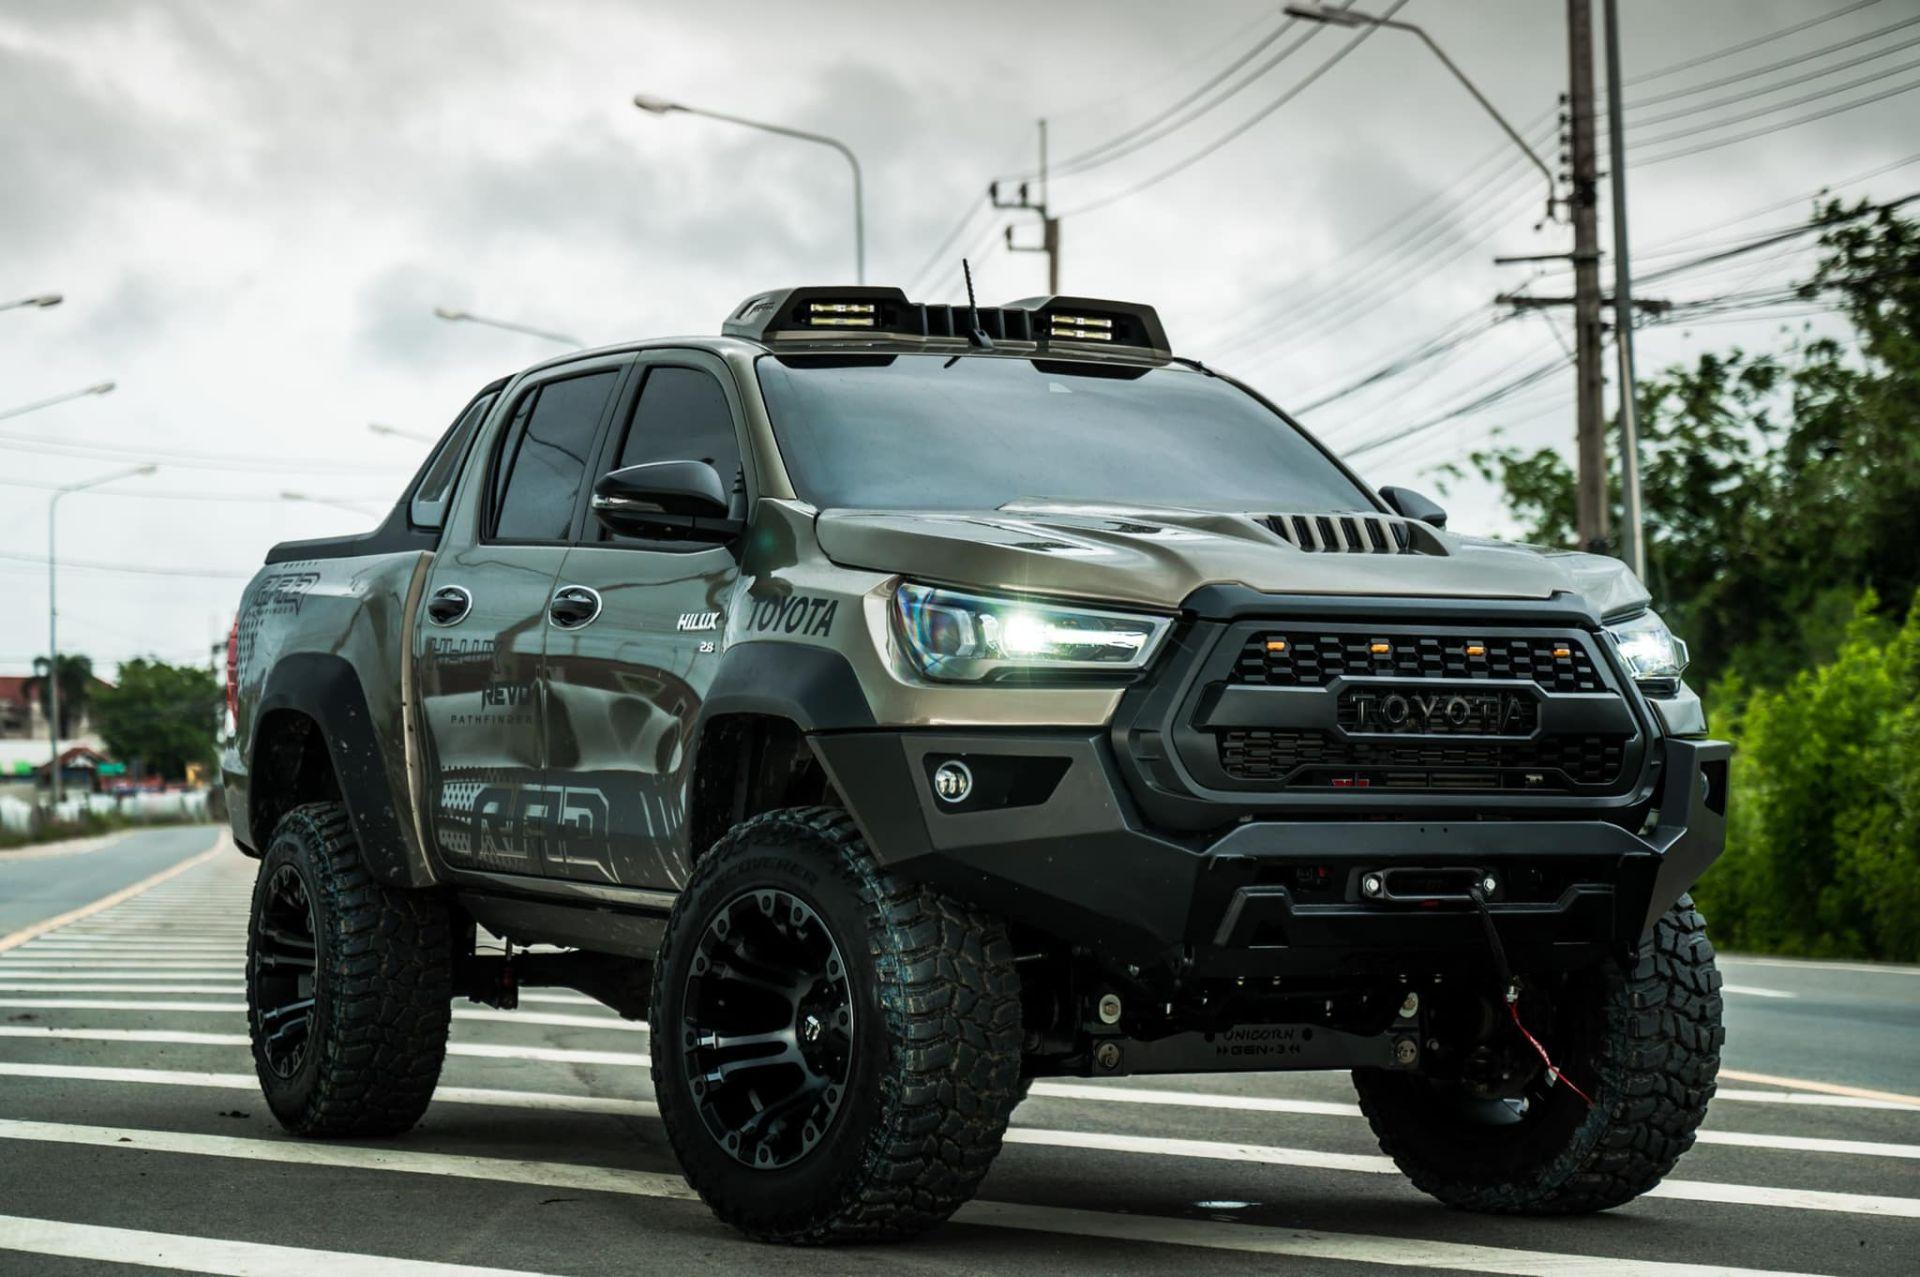 Toyota-Hilux-Pathfinder-by-RAD-15